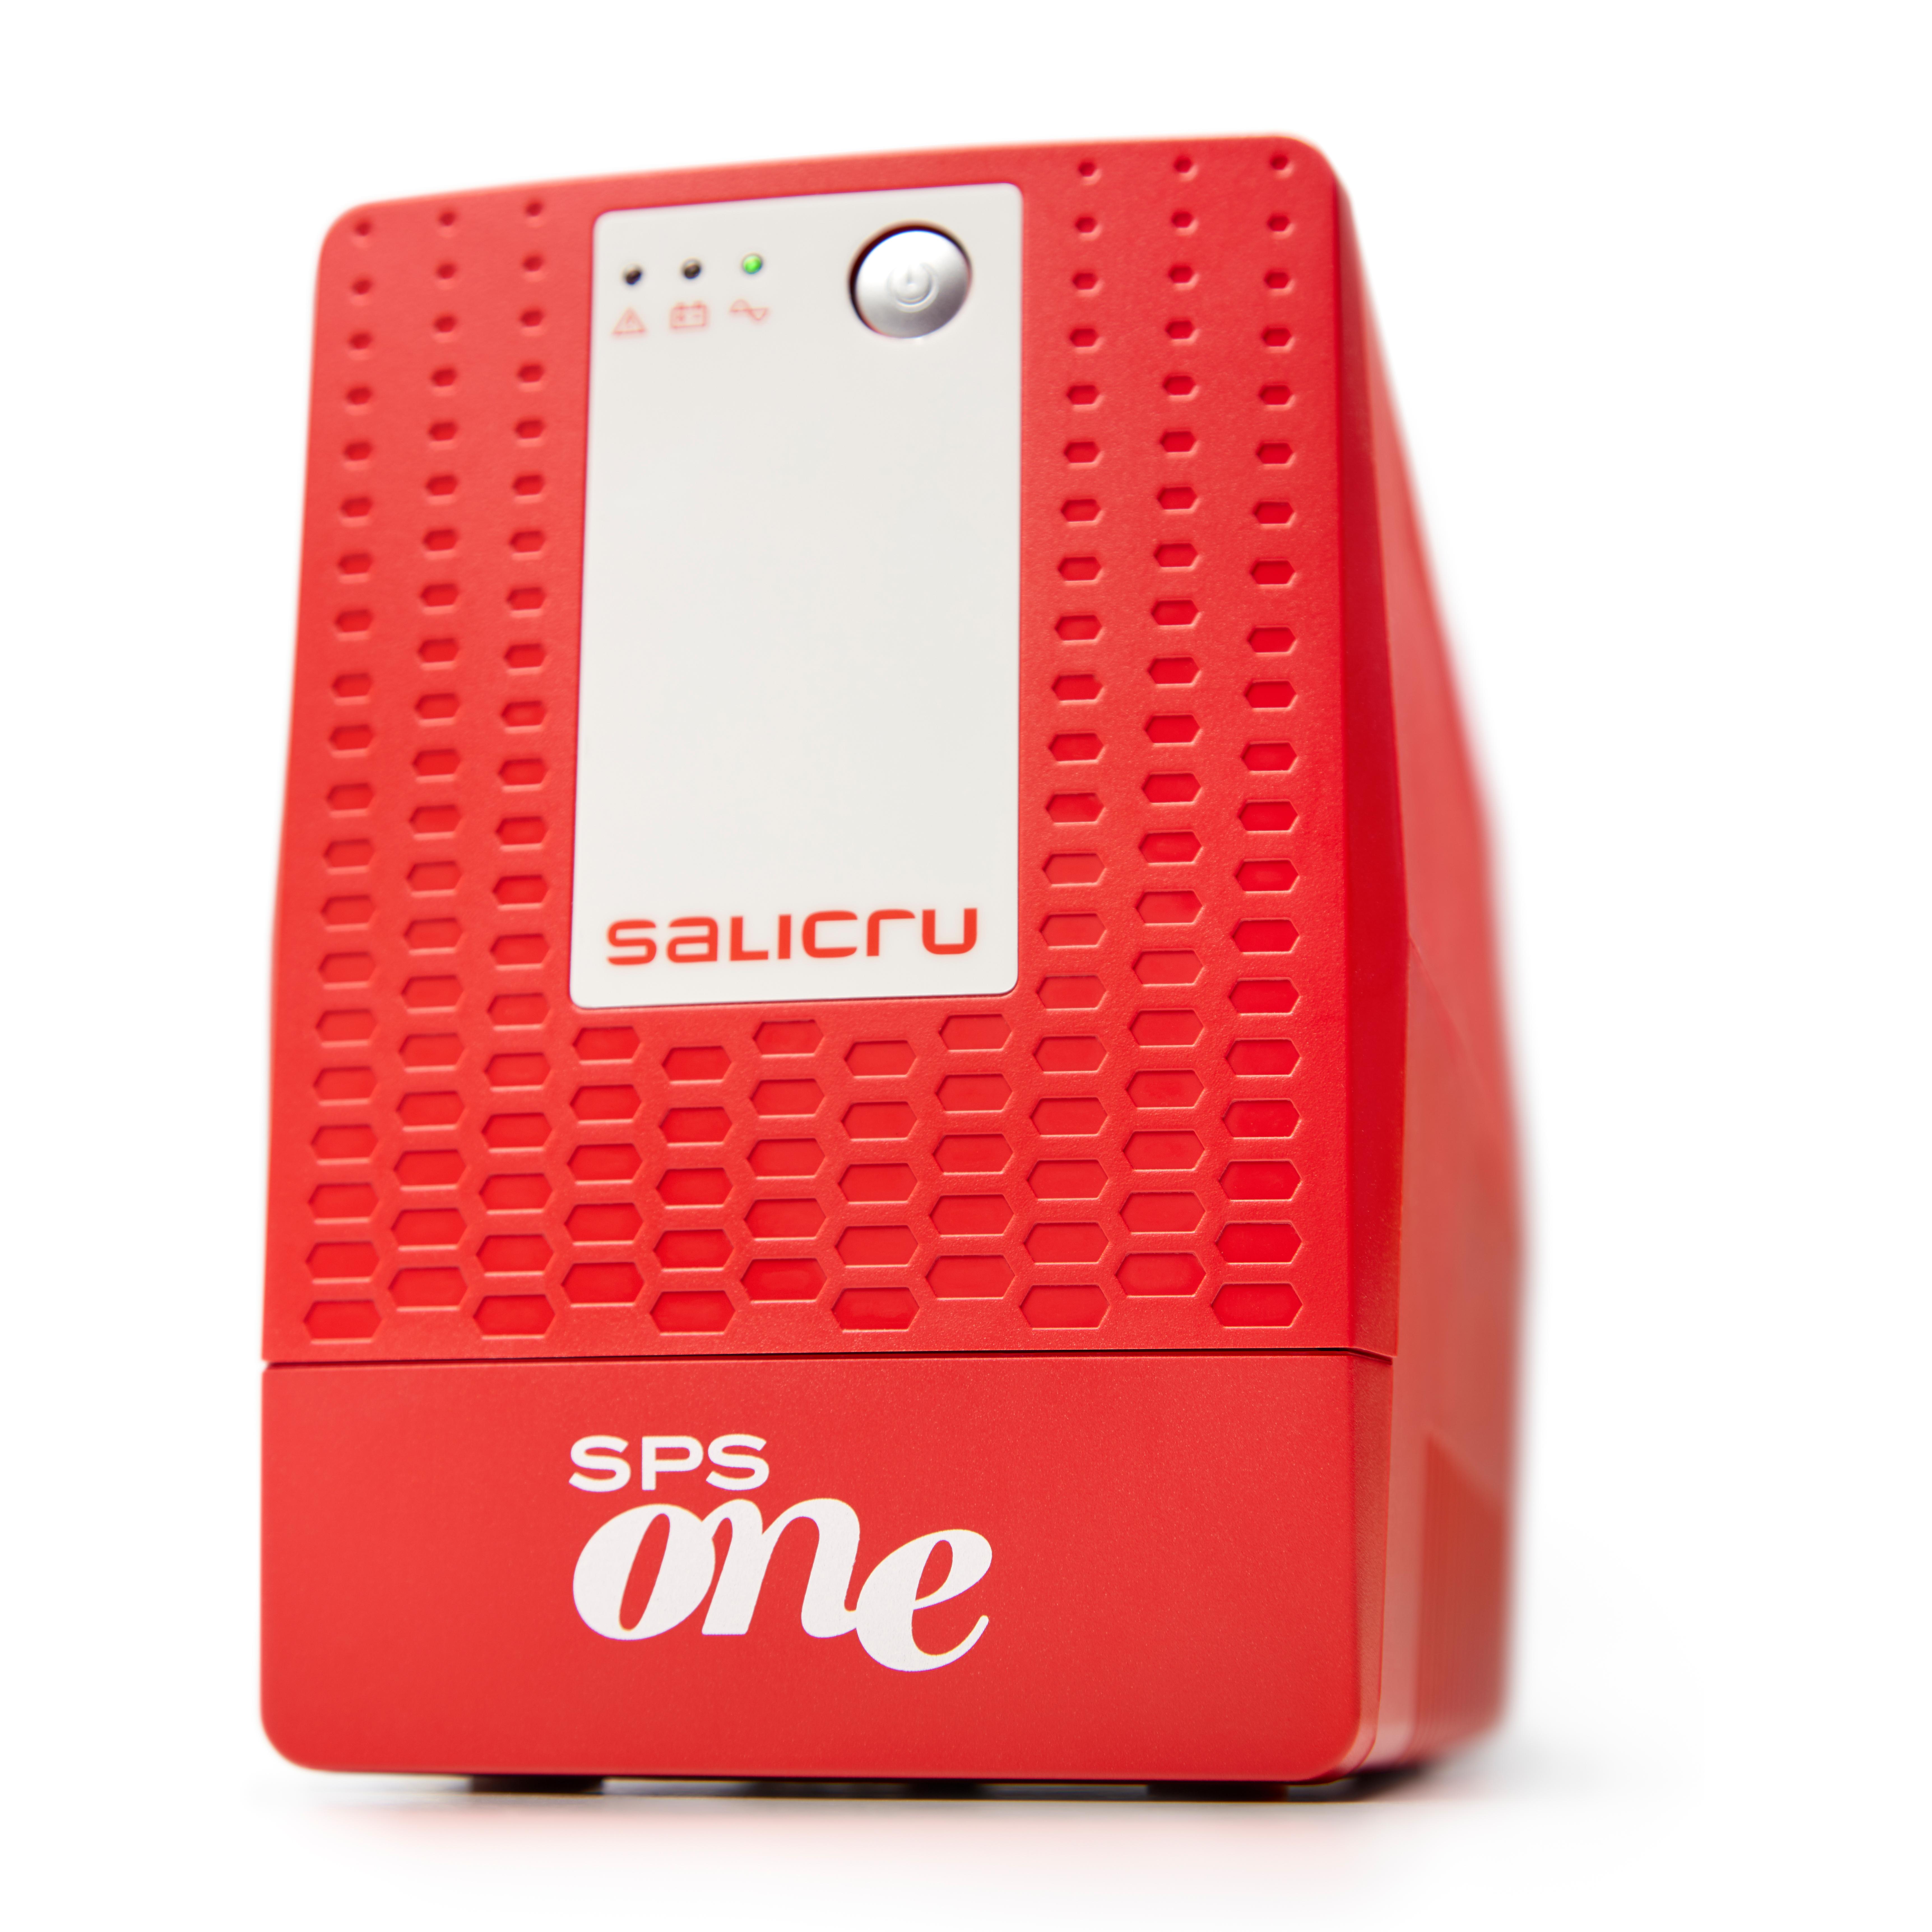 SALICRU SPS 1500 ONE IEC - Line-Interaktiv - 1500 VA - 900 W - Sine - 162 V - 290 V